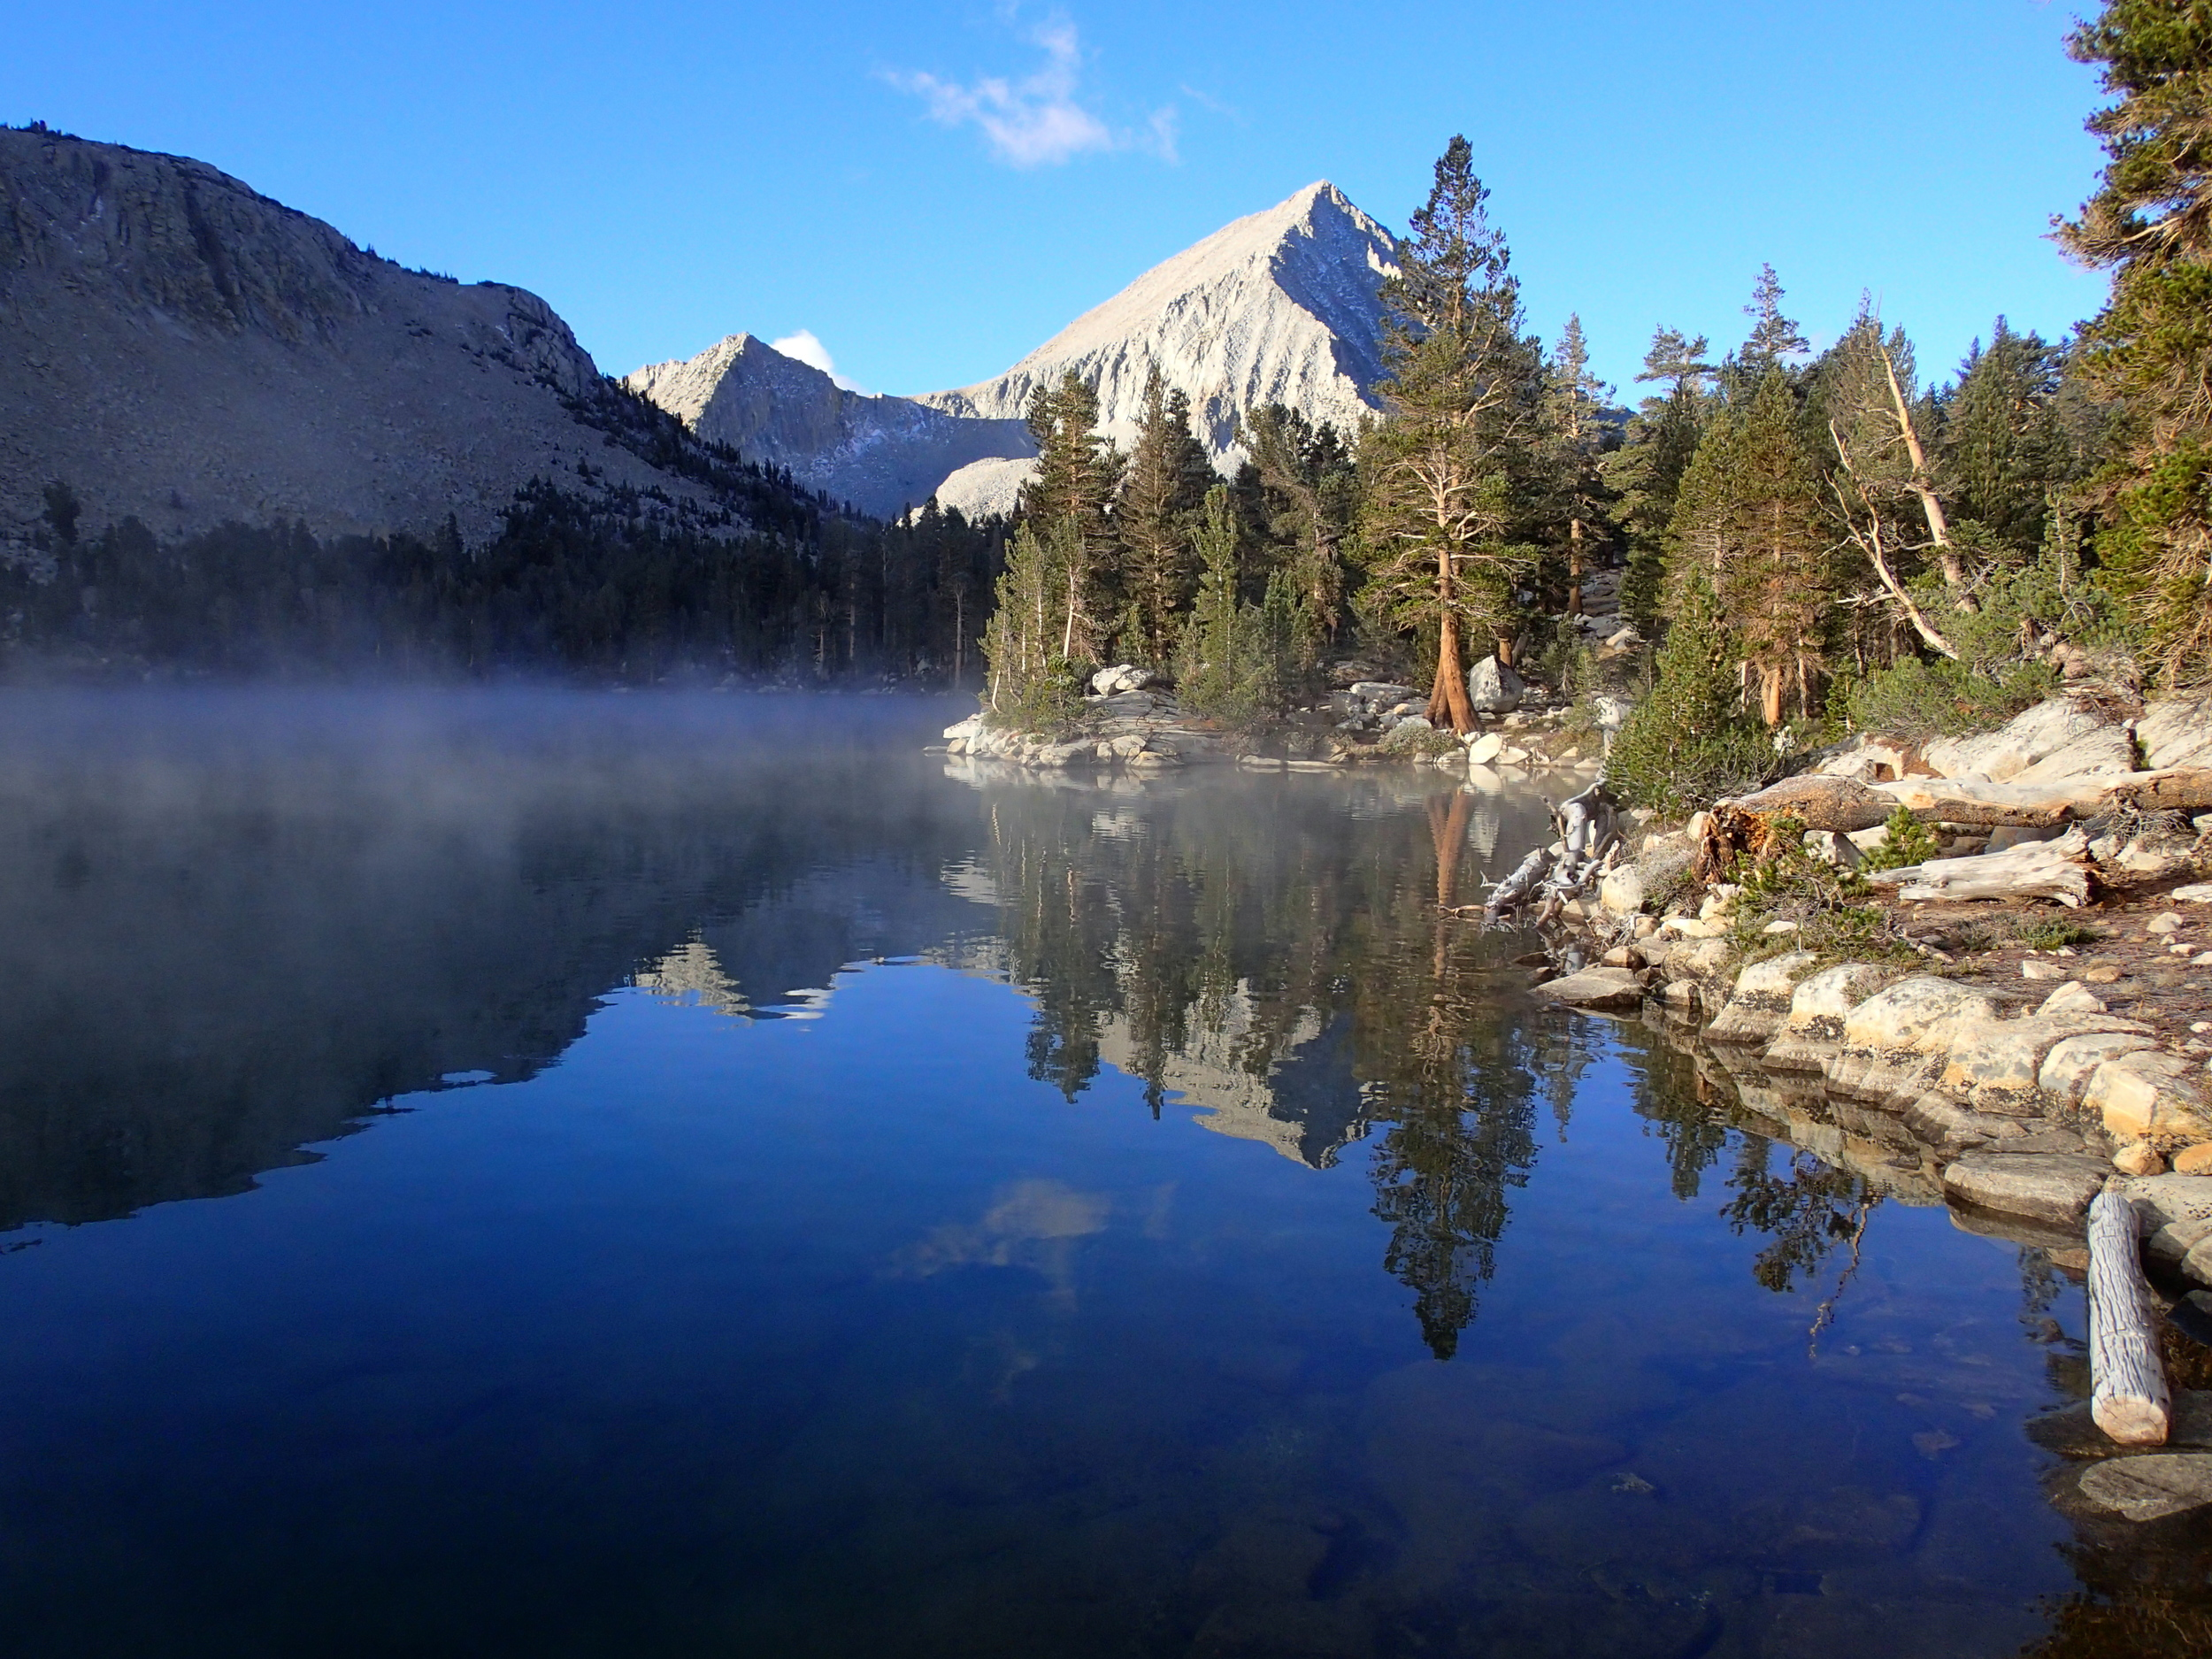 Arrow Peak reflected in Bench Lake